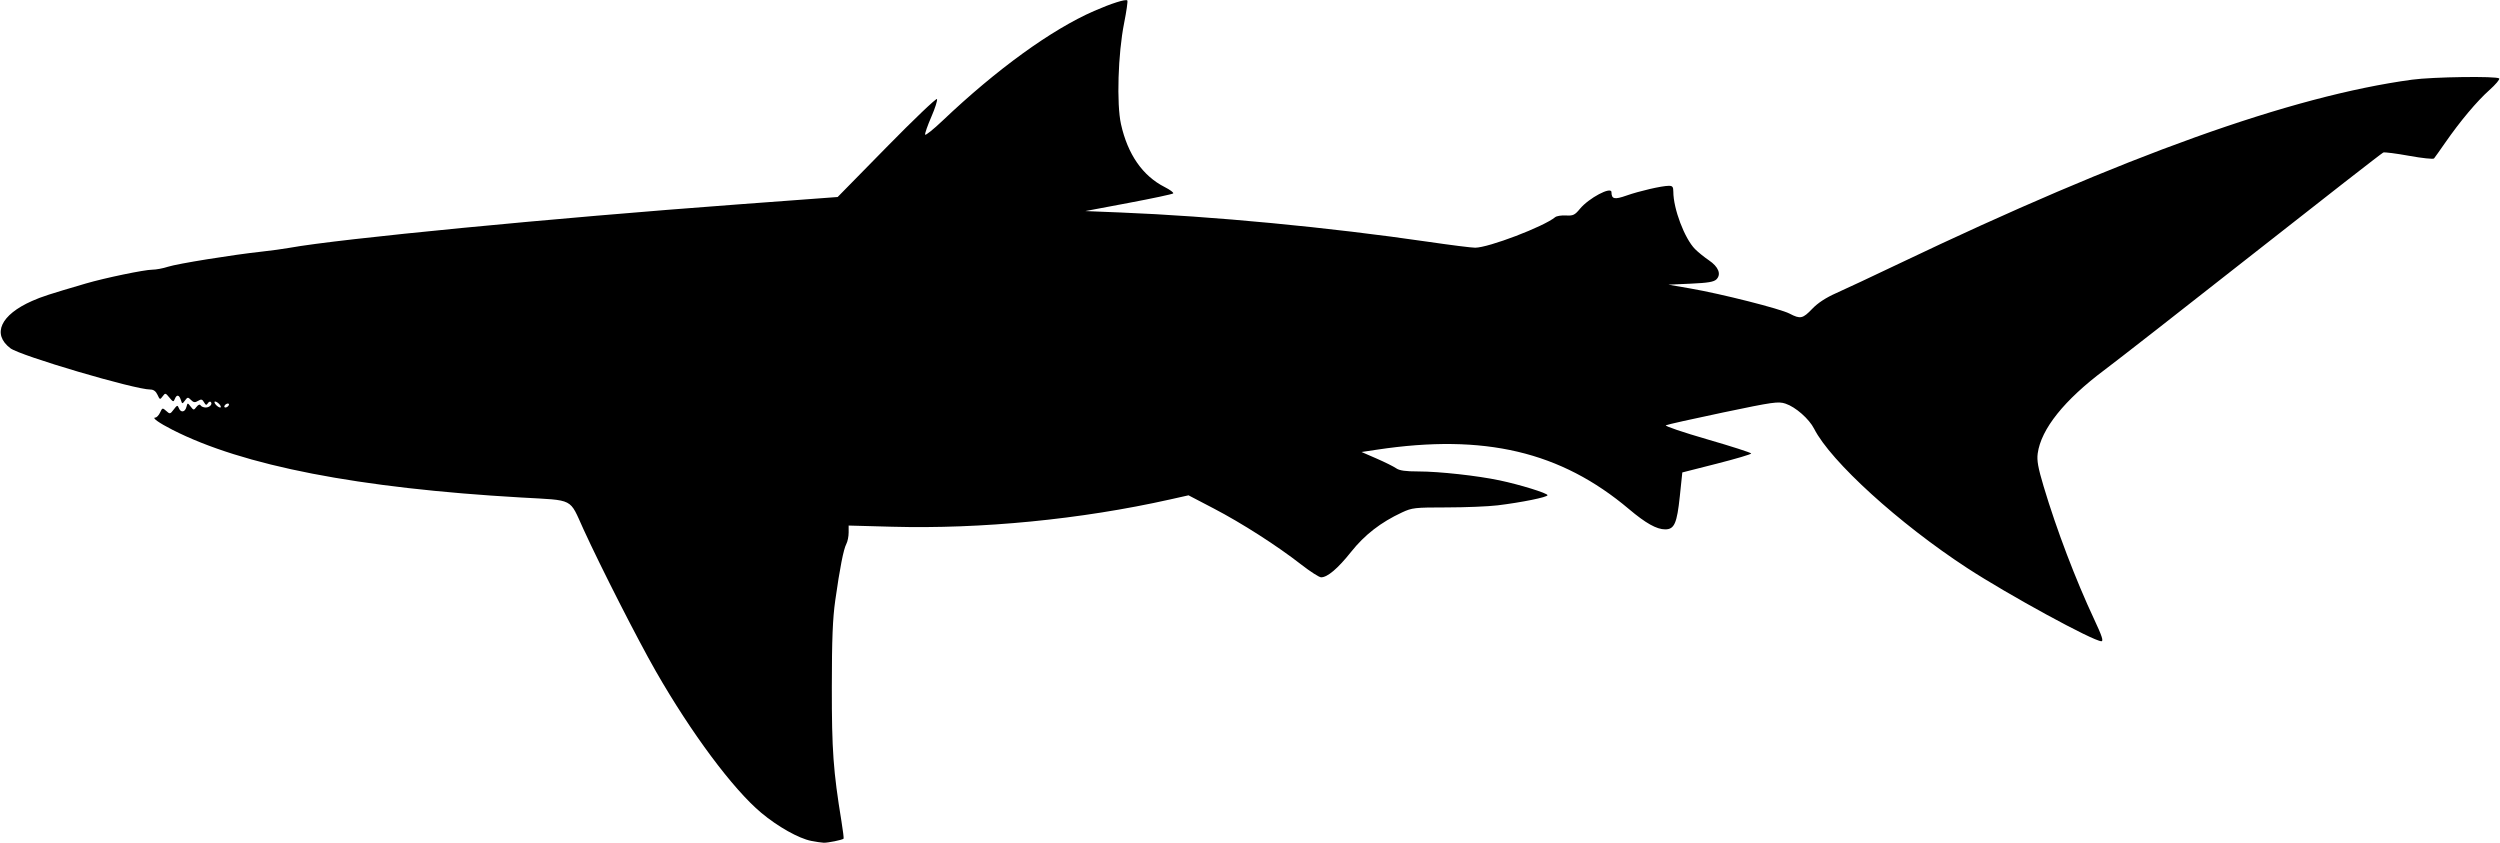 Silhouette bclipart sharksilhouettebclipart animals. Clipart shark lemon shark